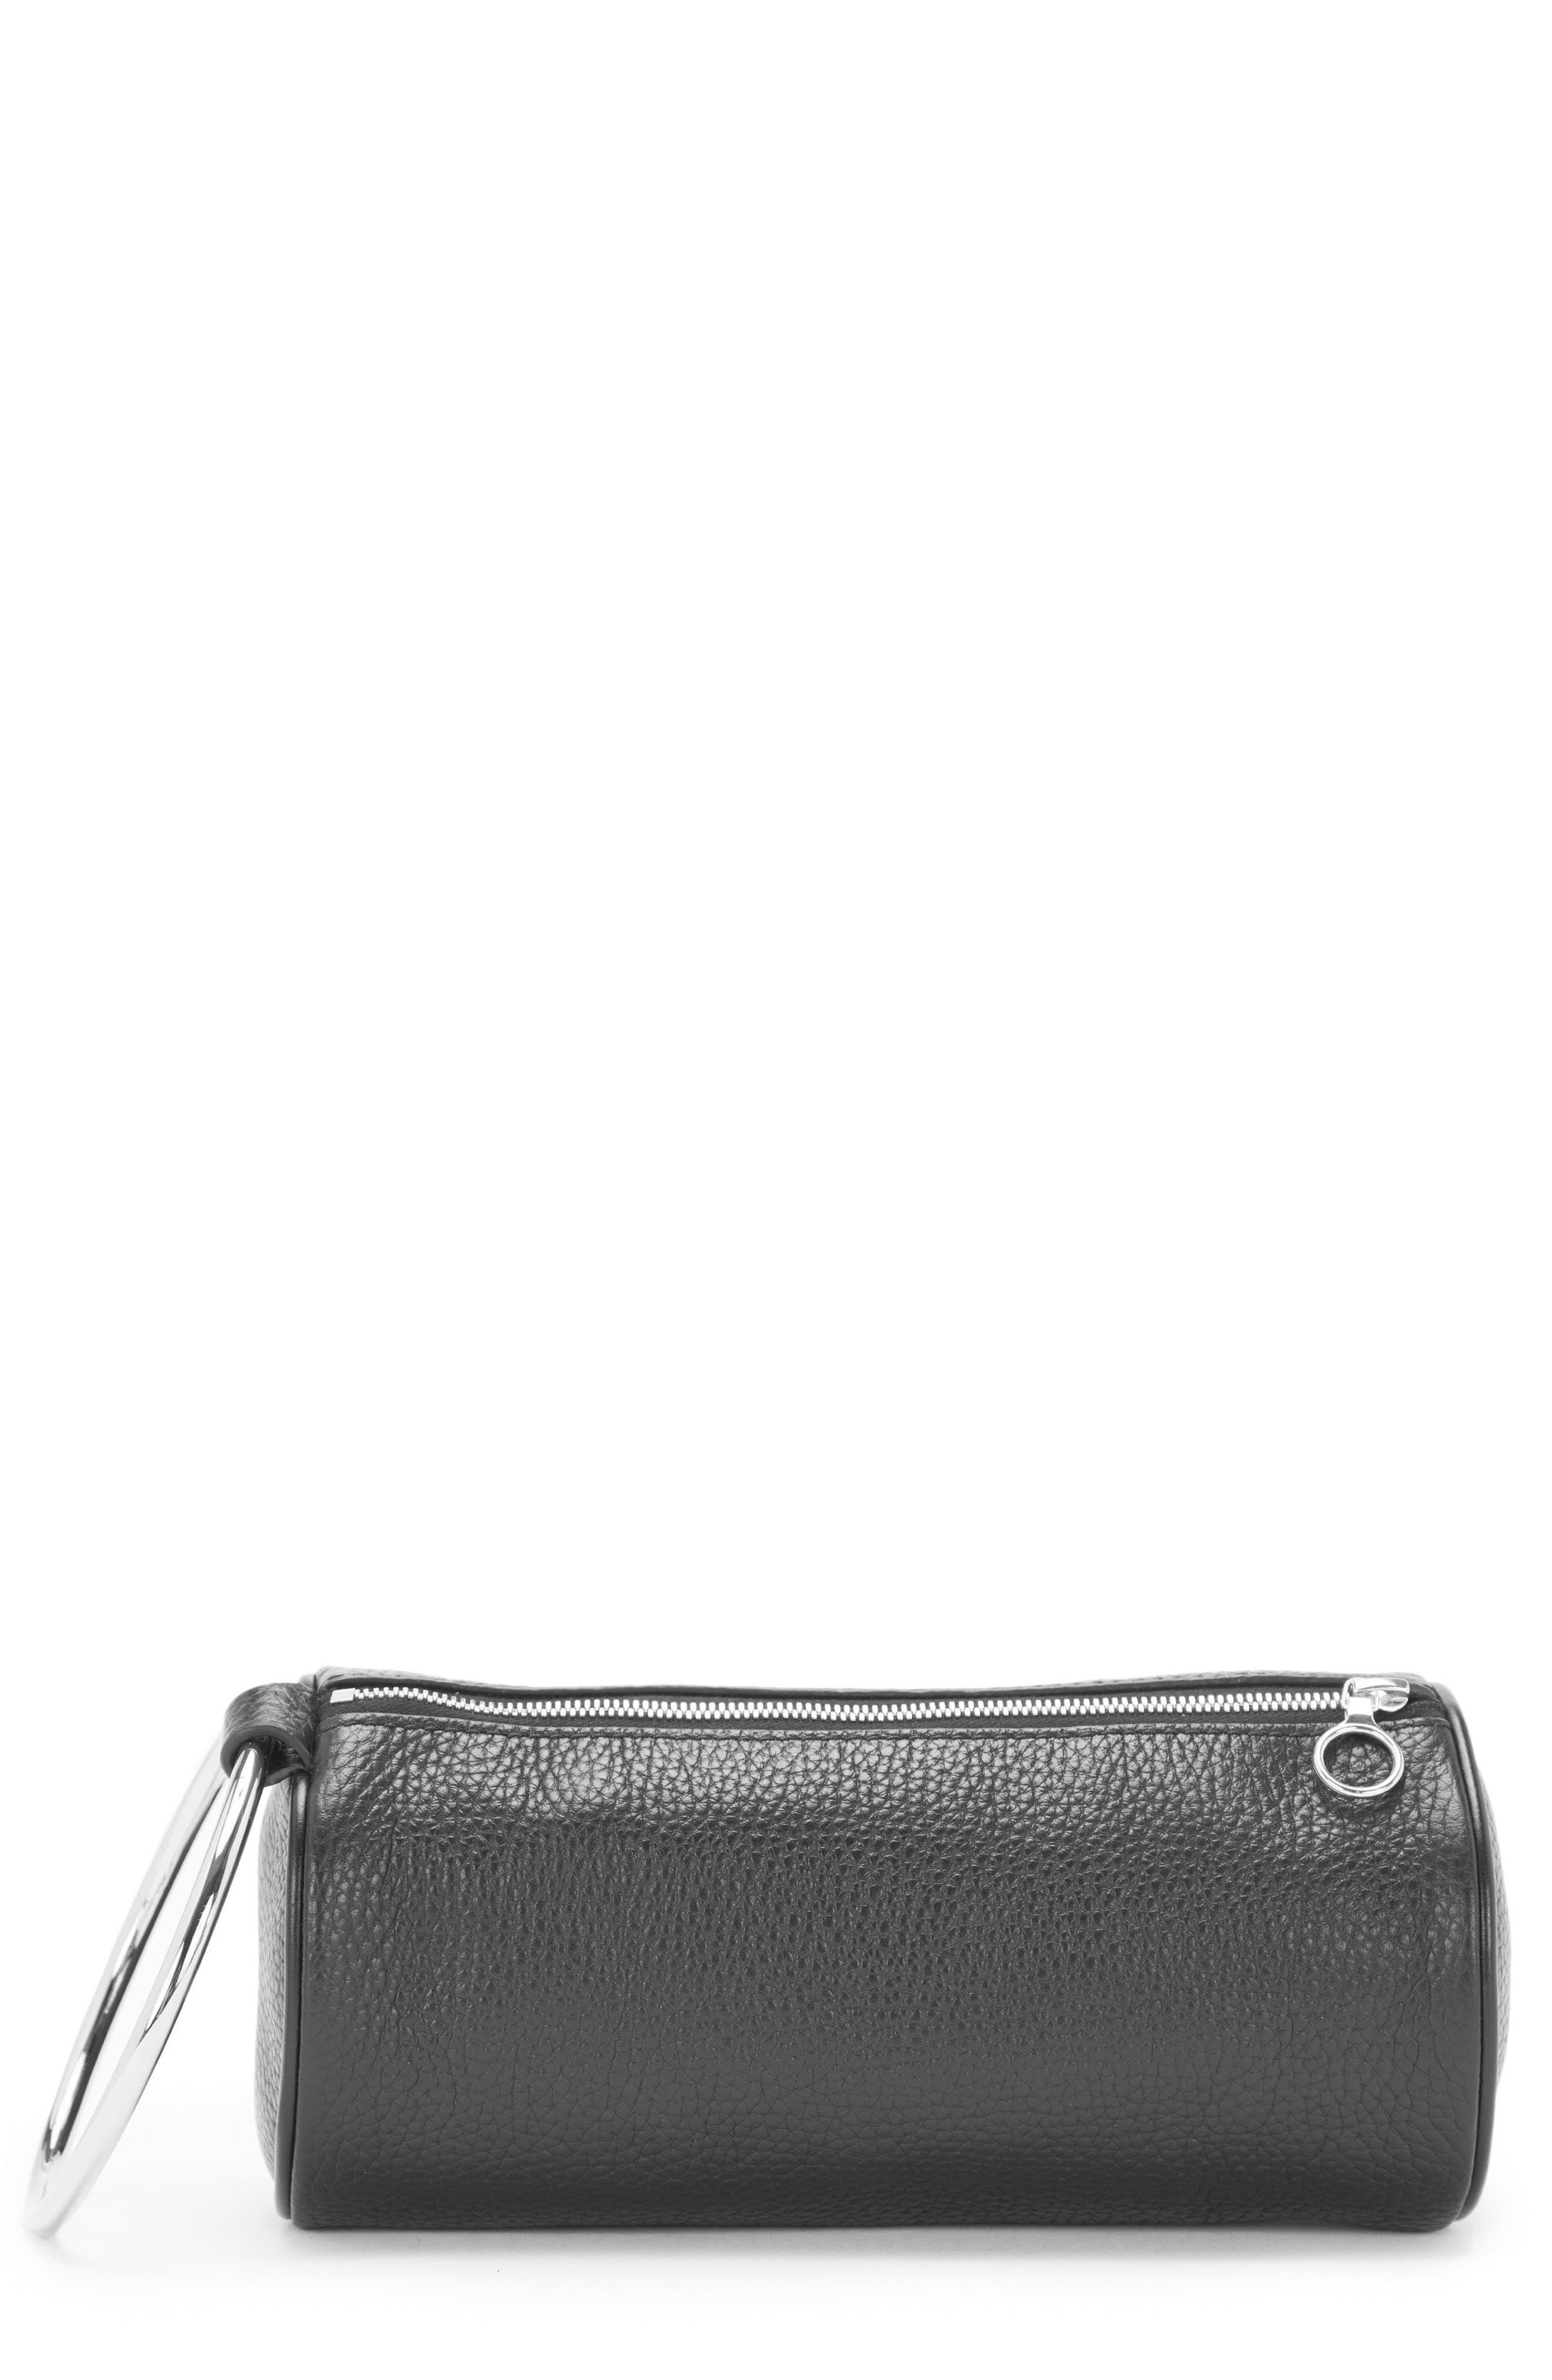 KARA Pebbled Leather Duffel Wristlet Clutch